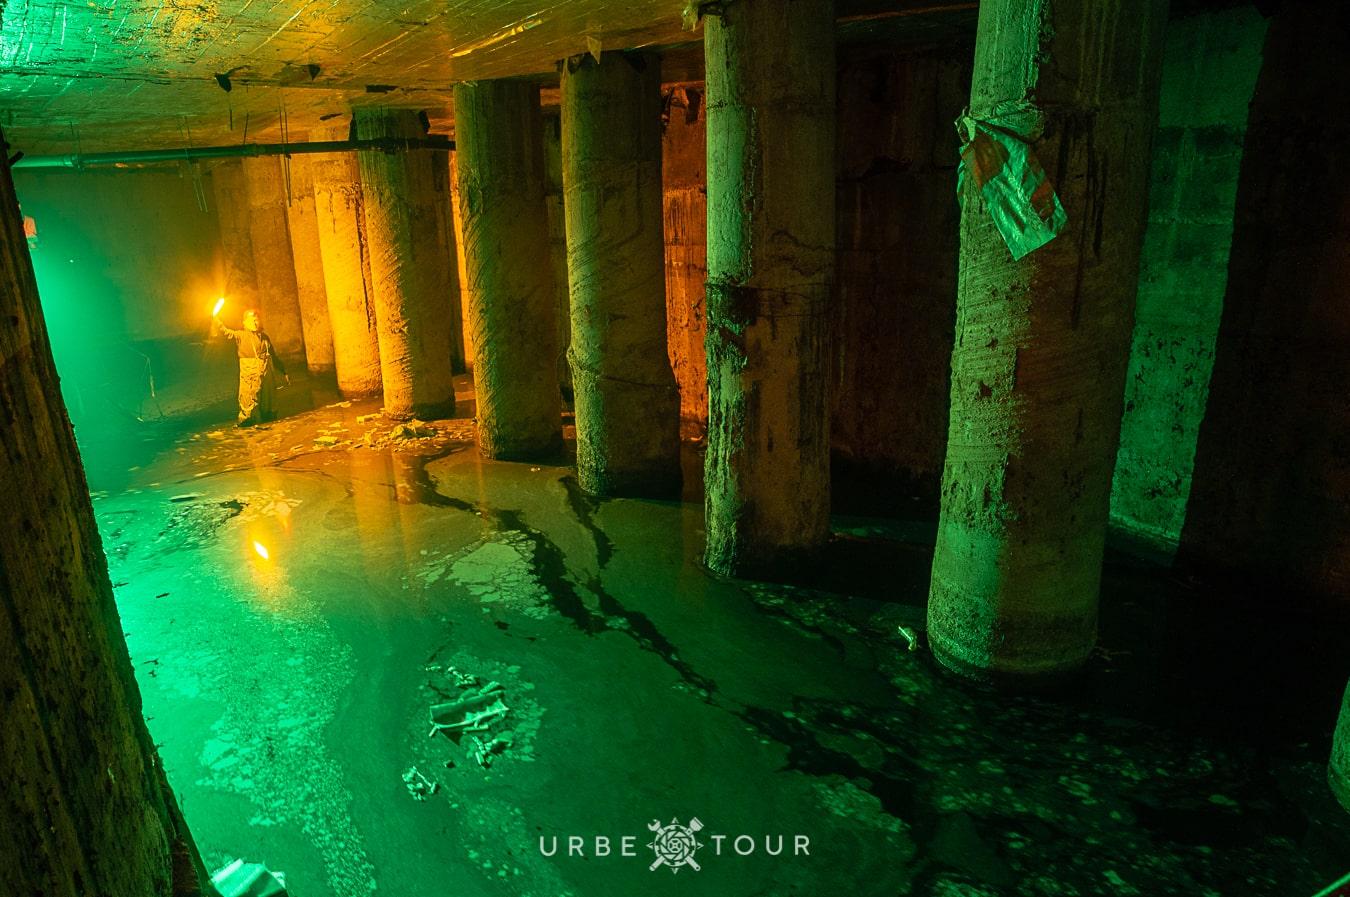 skomoroh-underground-river17 EXPLORING UNDERGROUND RIVER SKOMOROH IN KIEV